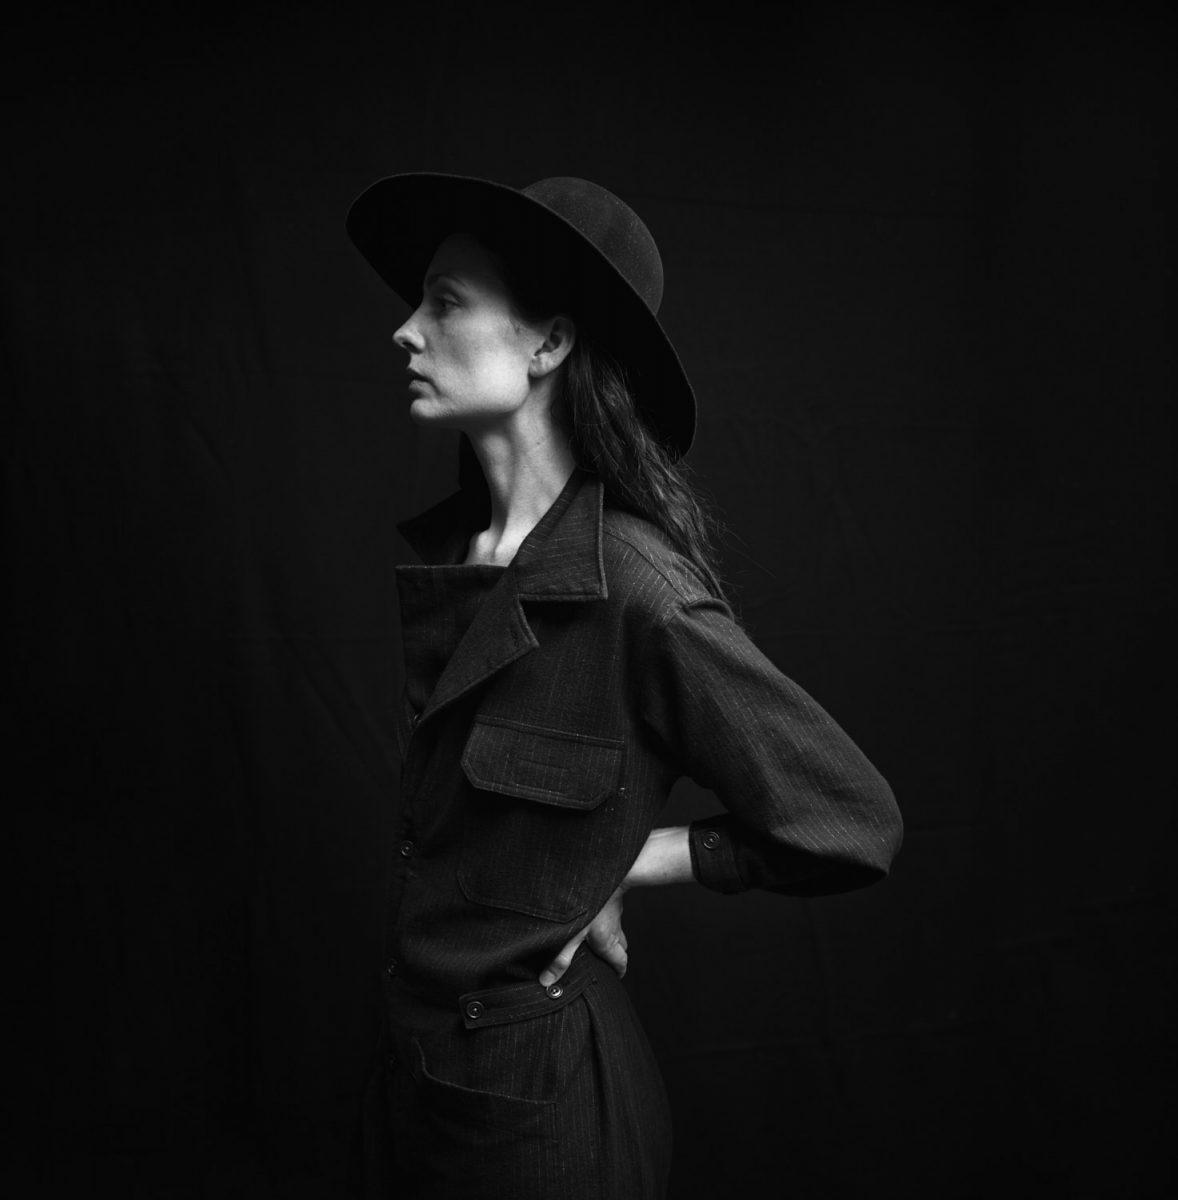 hye sun mun FW 16/17, FASHION, portraiture, woman, black and white, portrait, hands, artist, new york, brooklyn